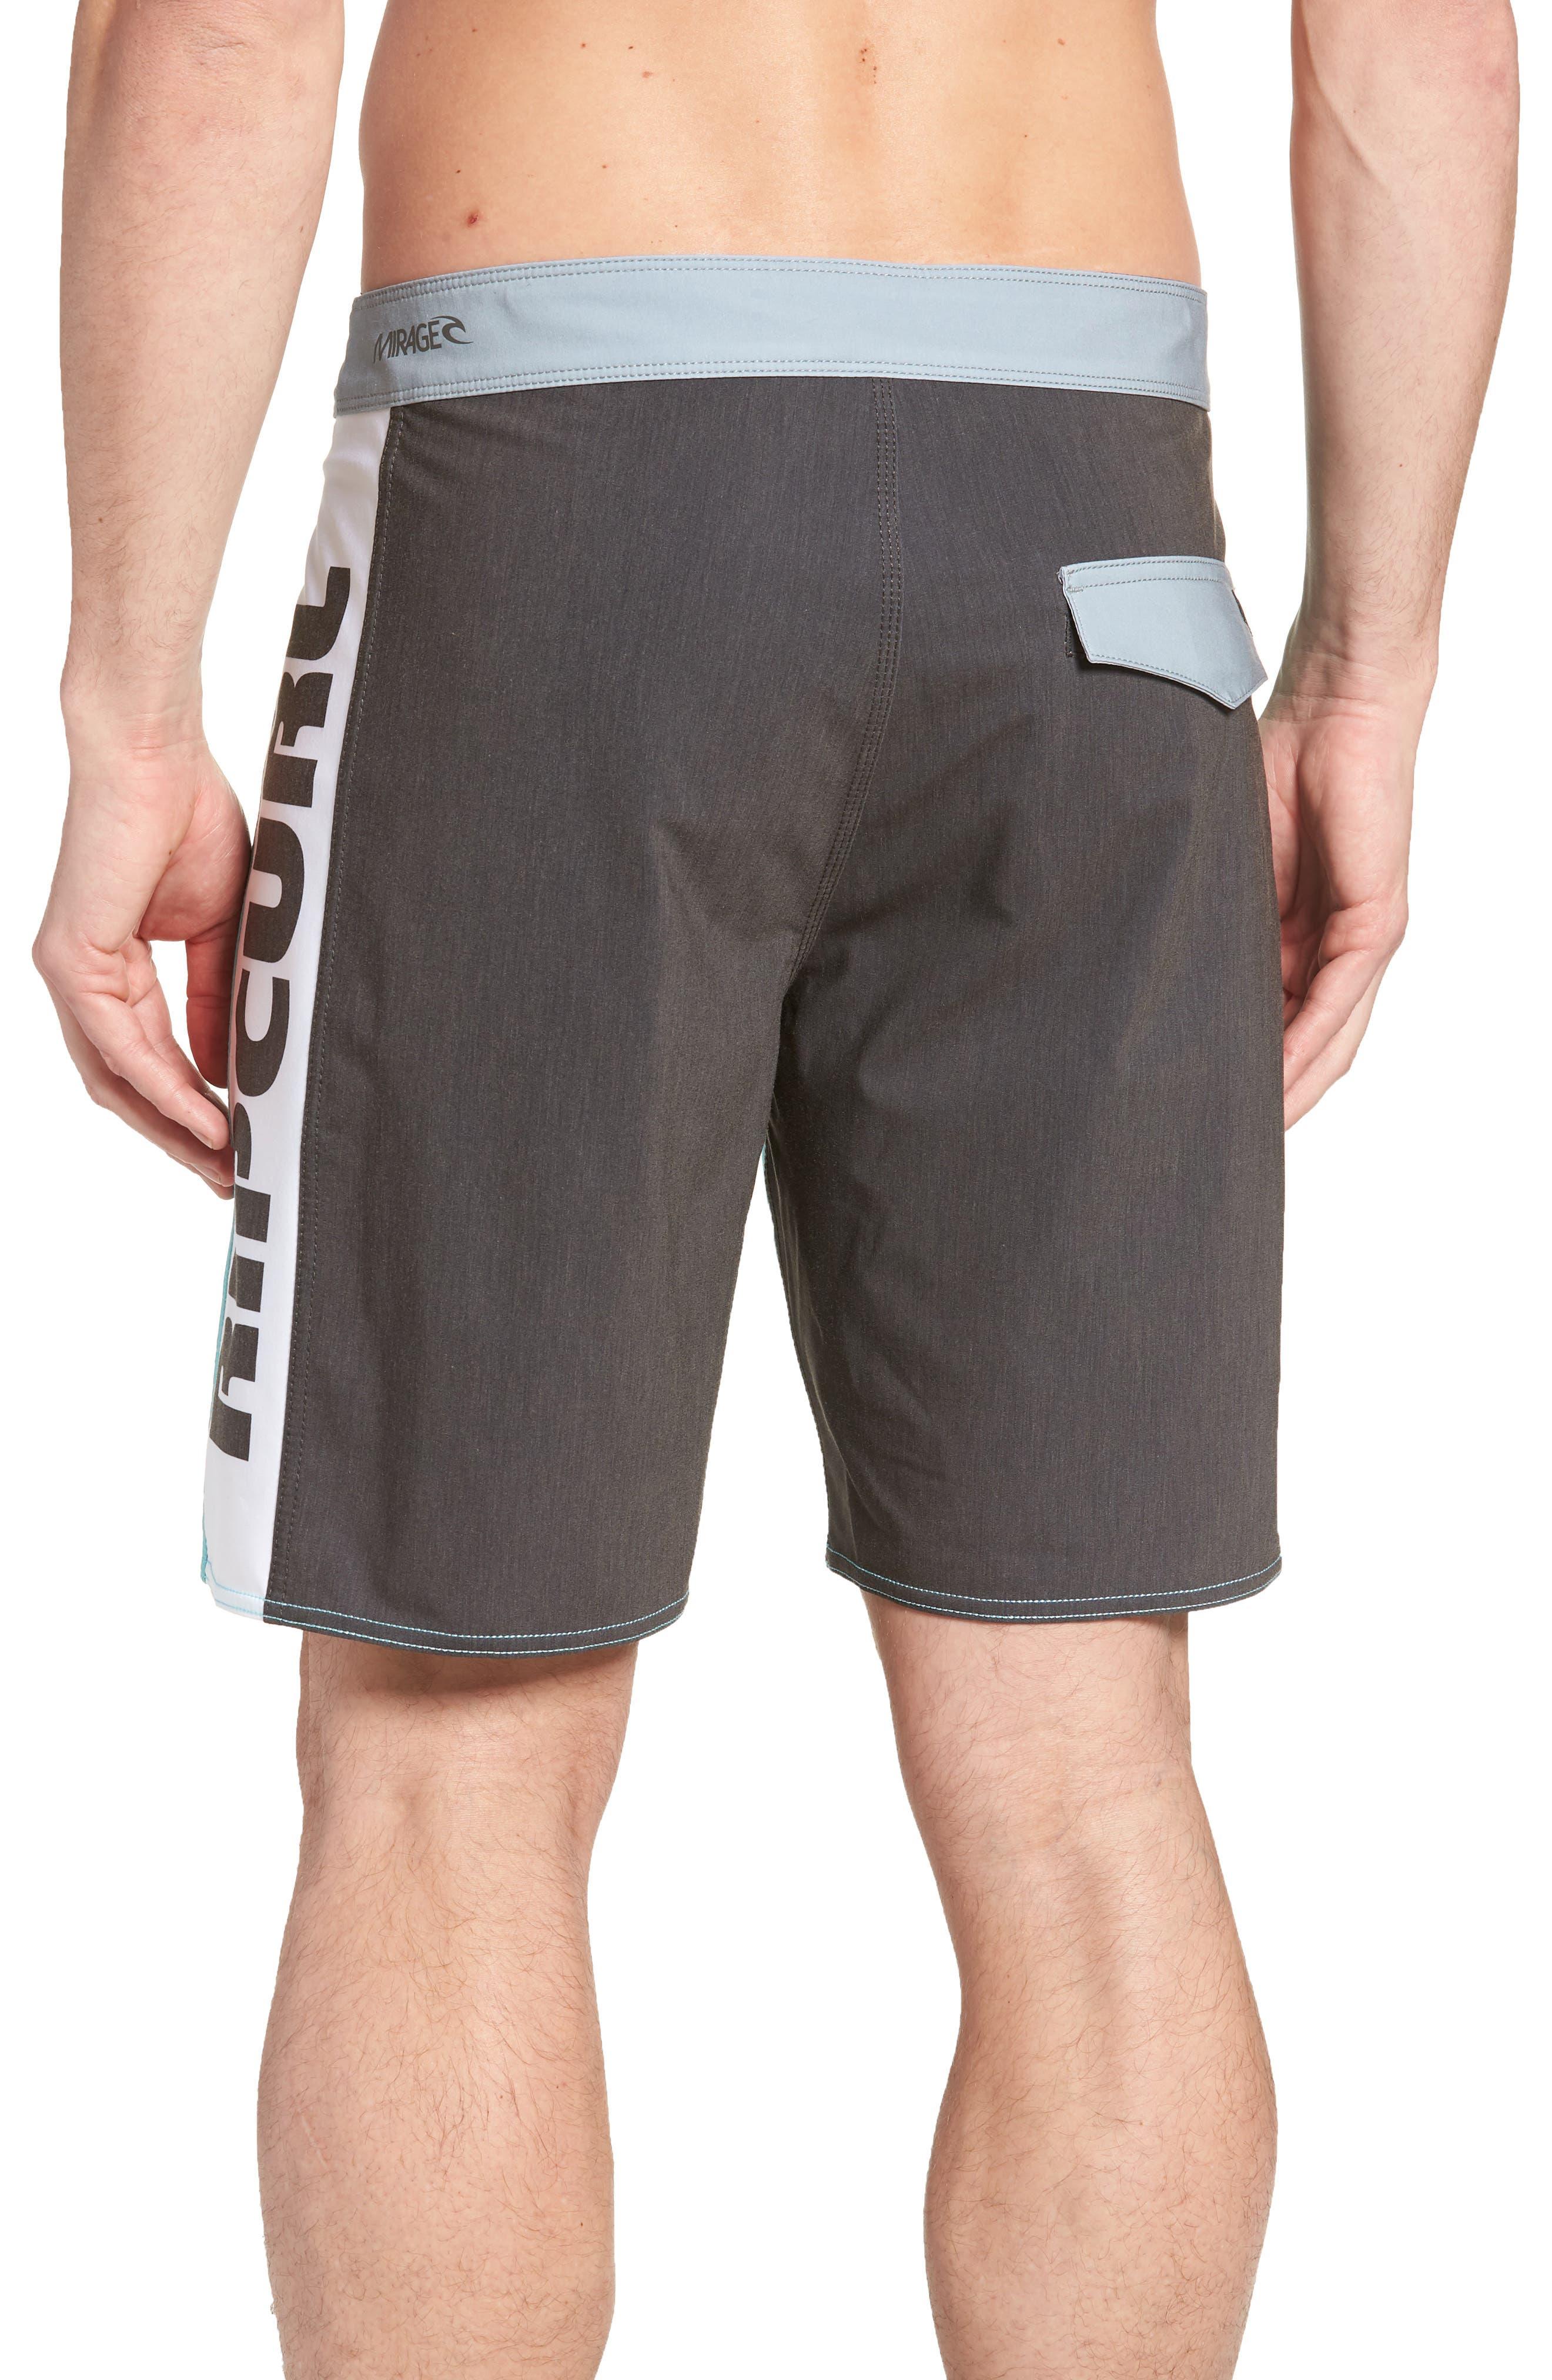 Mirage Owen Stretch Board Shorts,                             Alternate thumbnail 2, color,                             Aqua